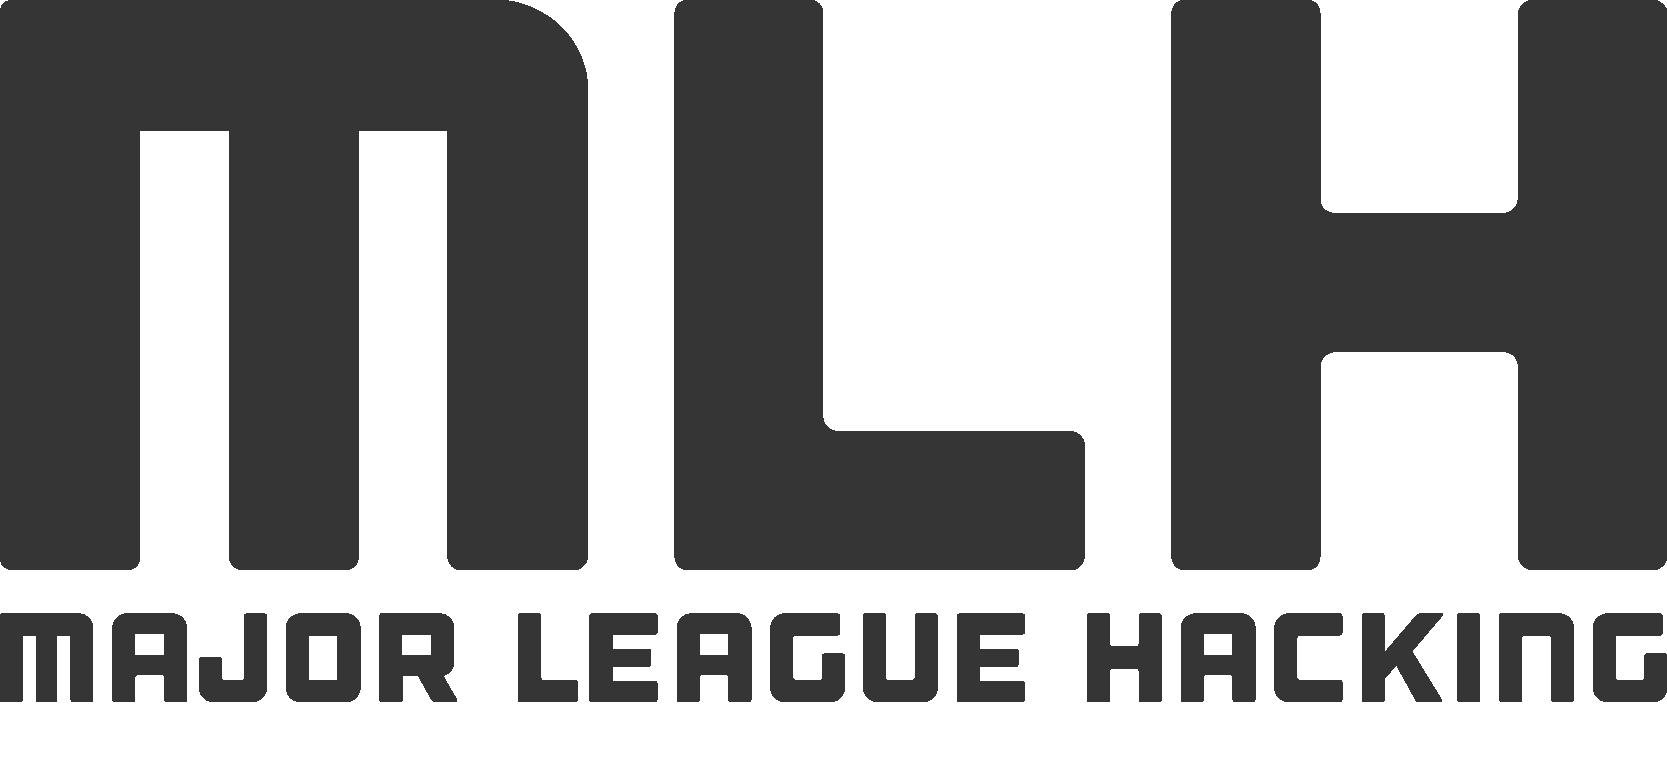 mlh-logo-grayscale